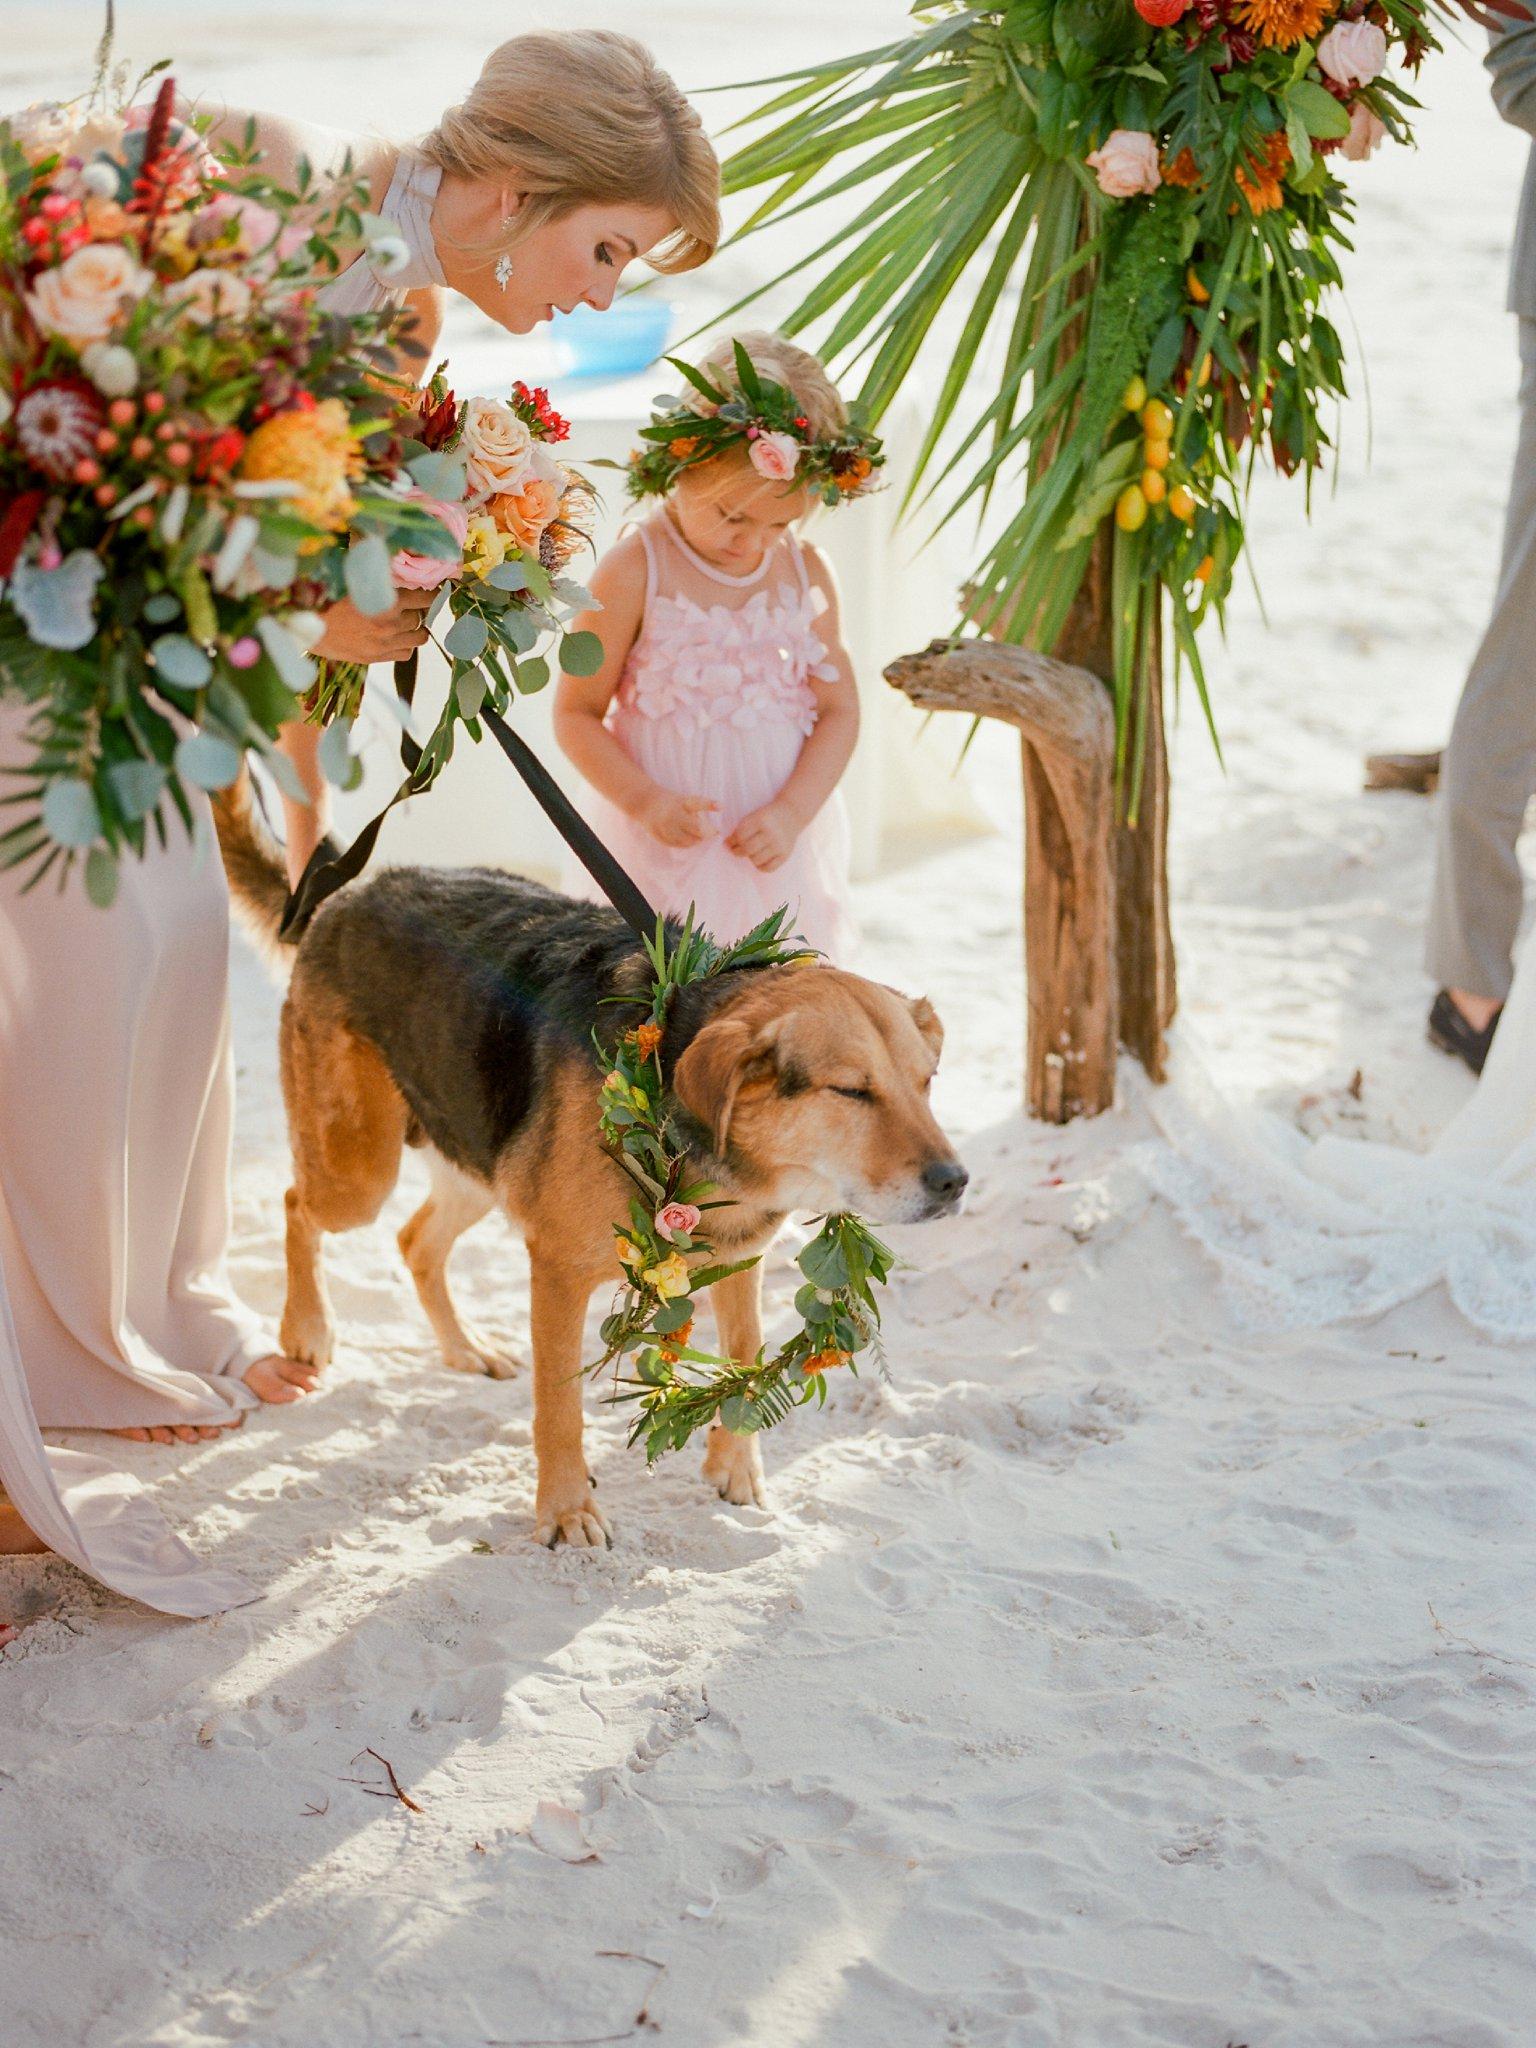 st+george+island+wedding+st+george+island+photographer+shannon+griffin+photography_0066.jpg